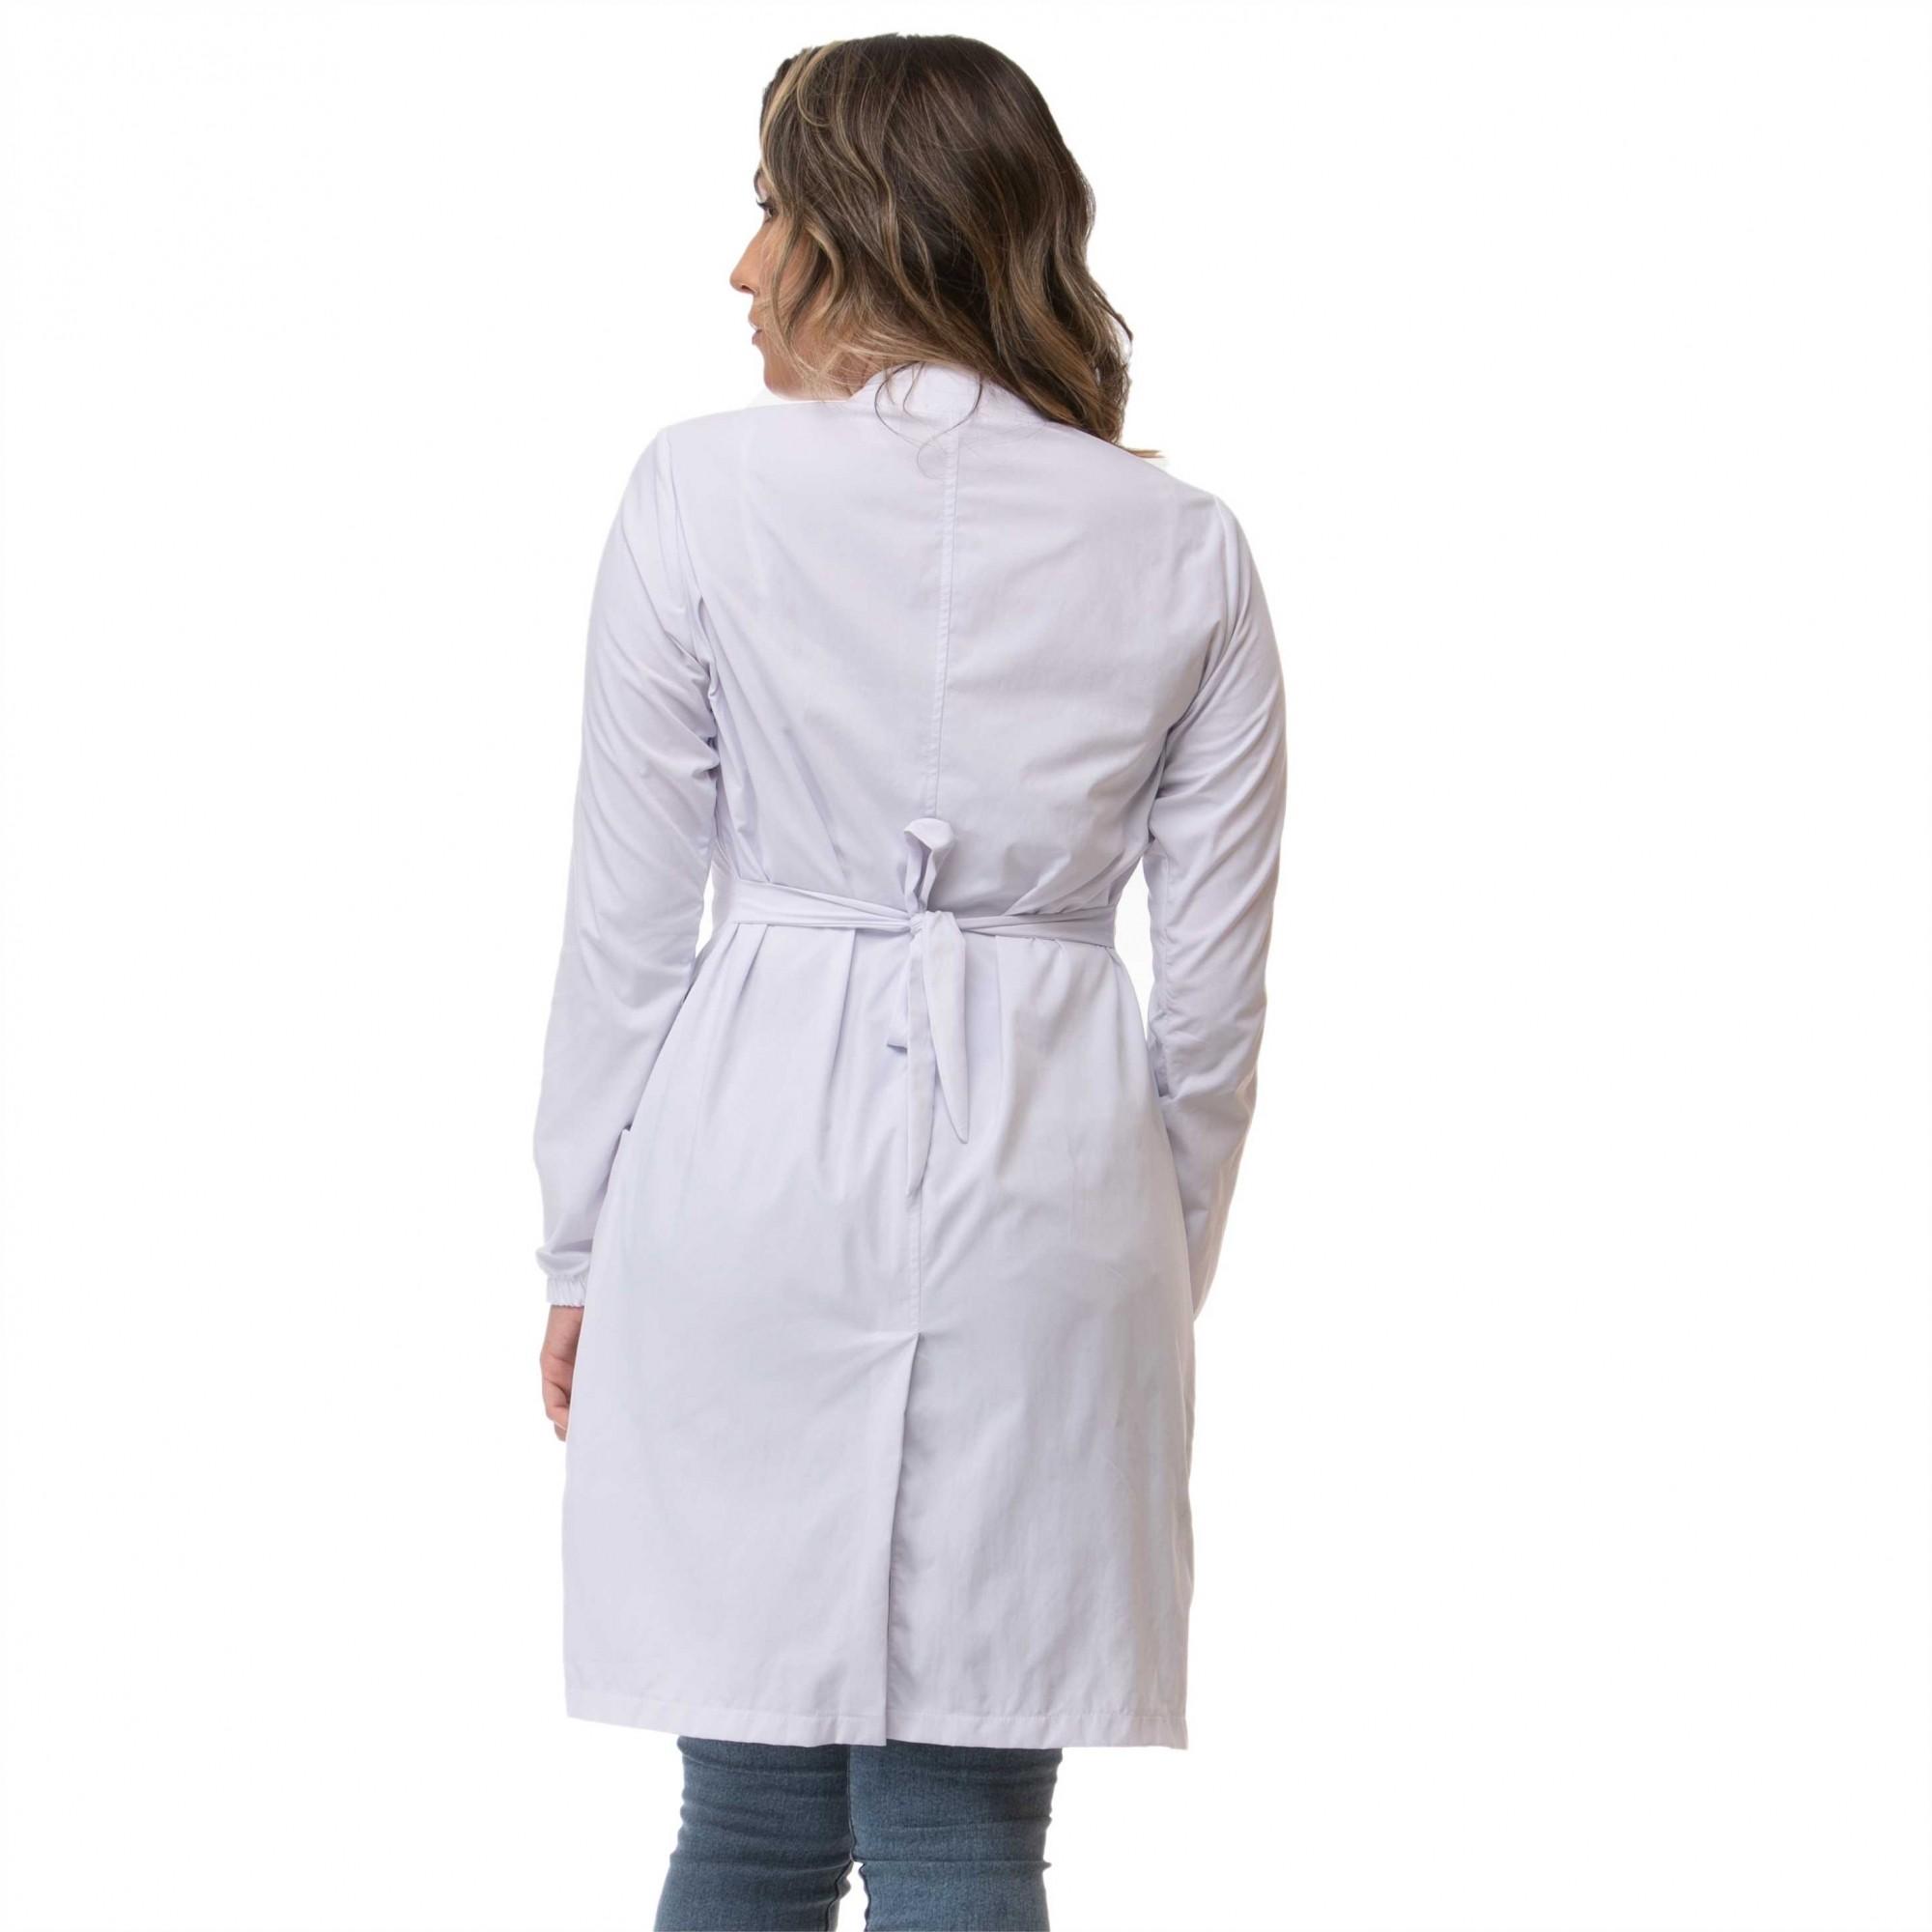 Jaleco Protect Antiviral Feminino